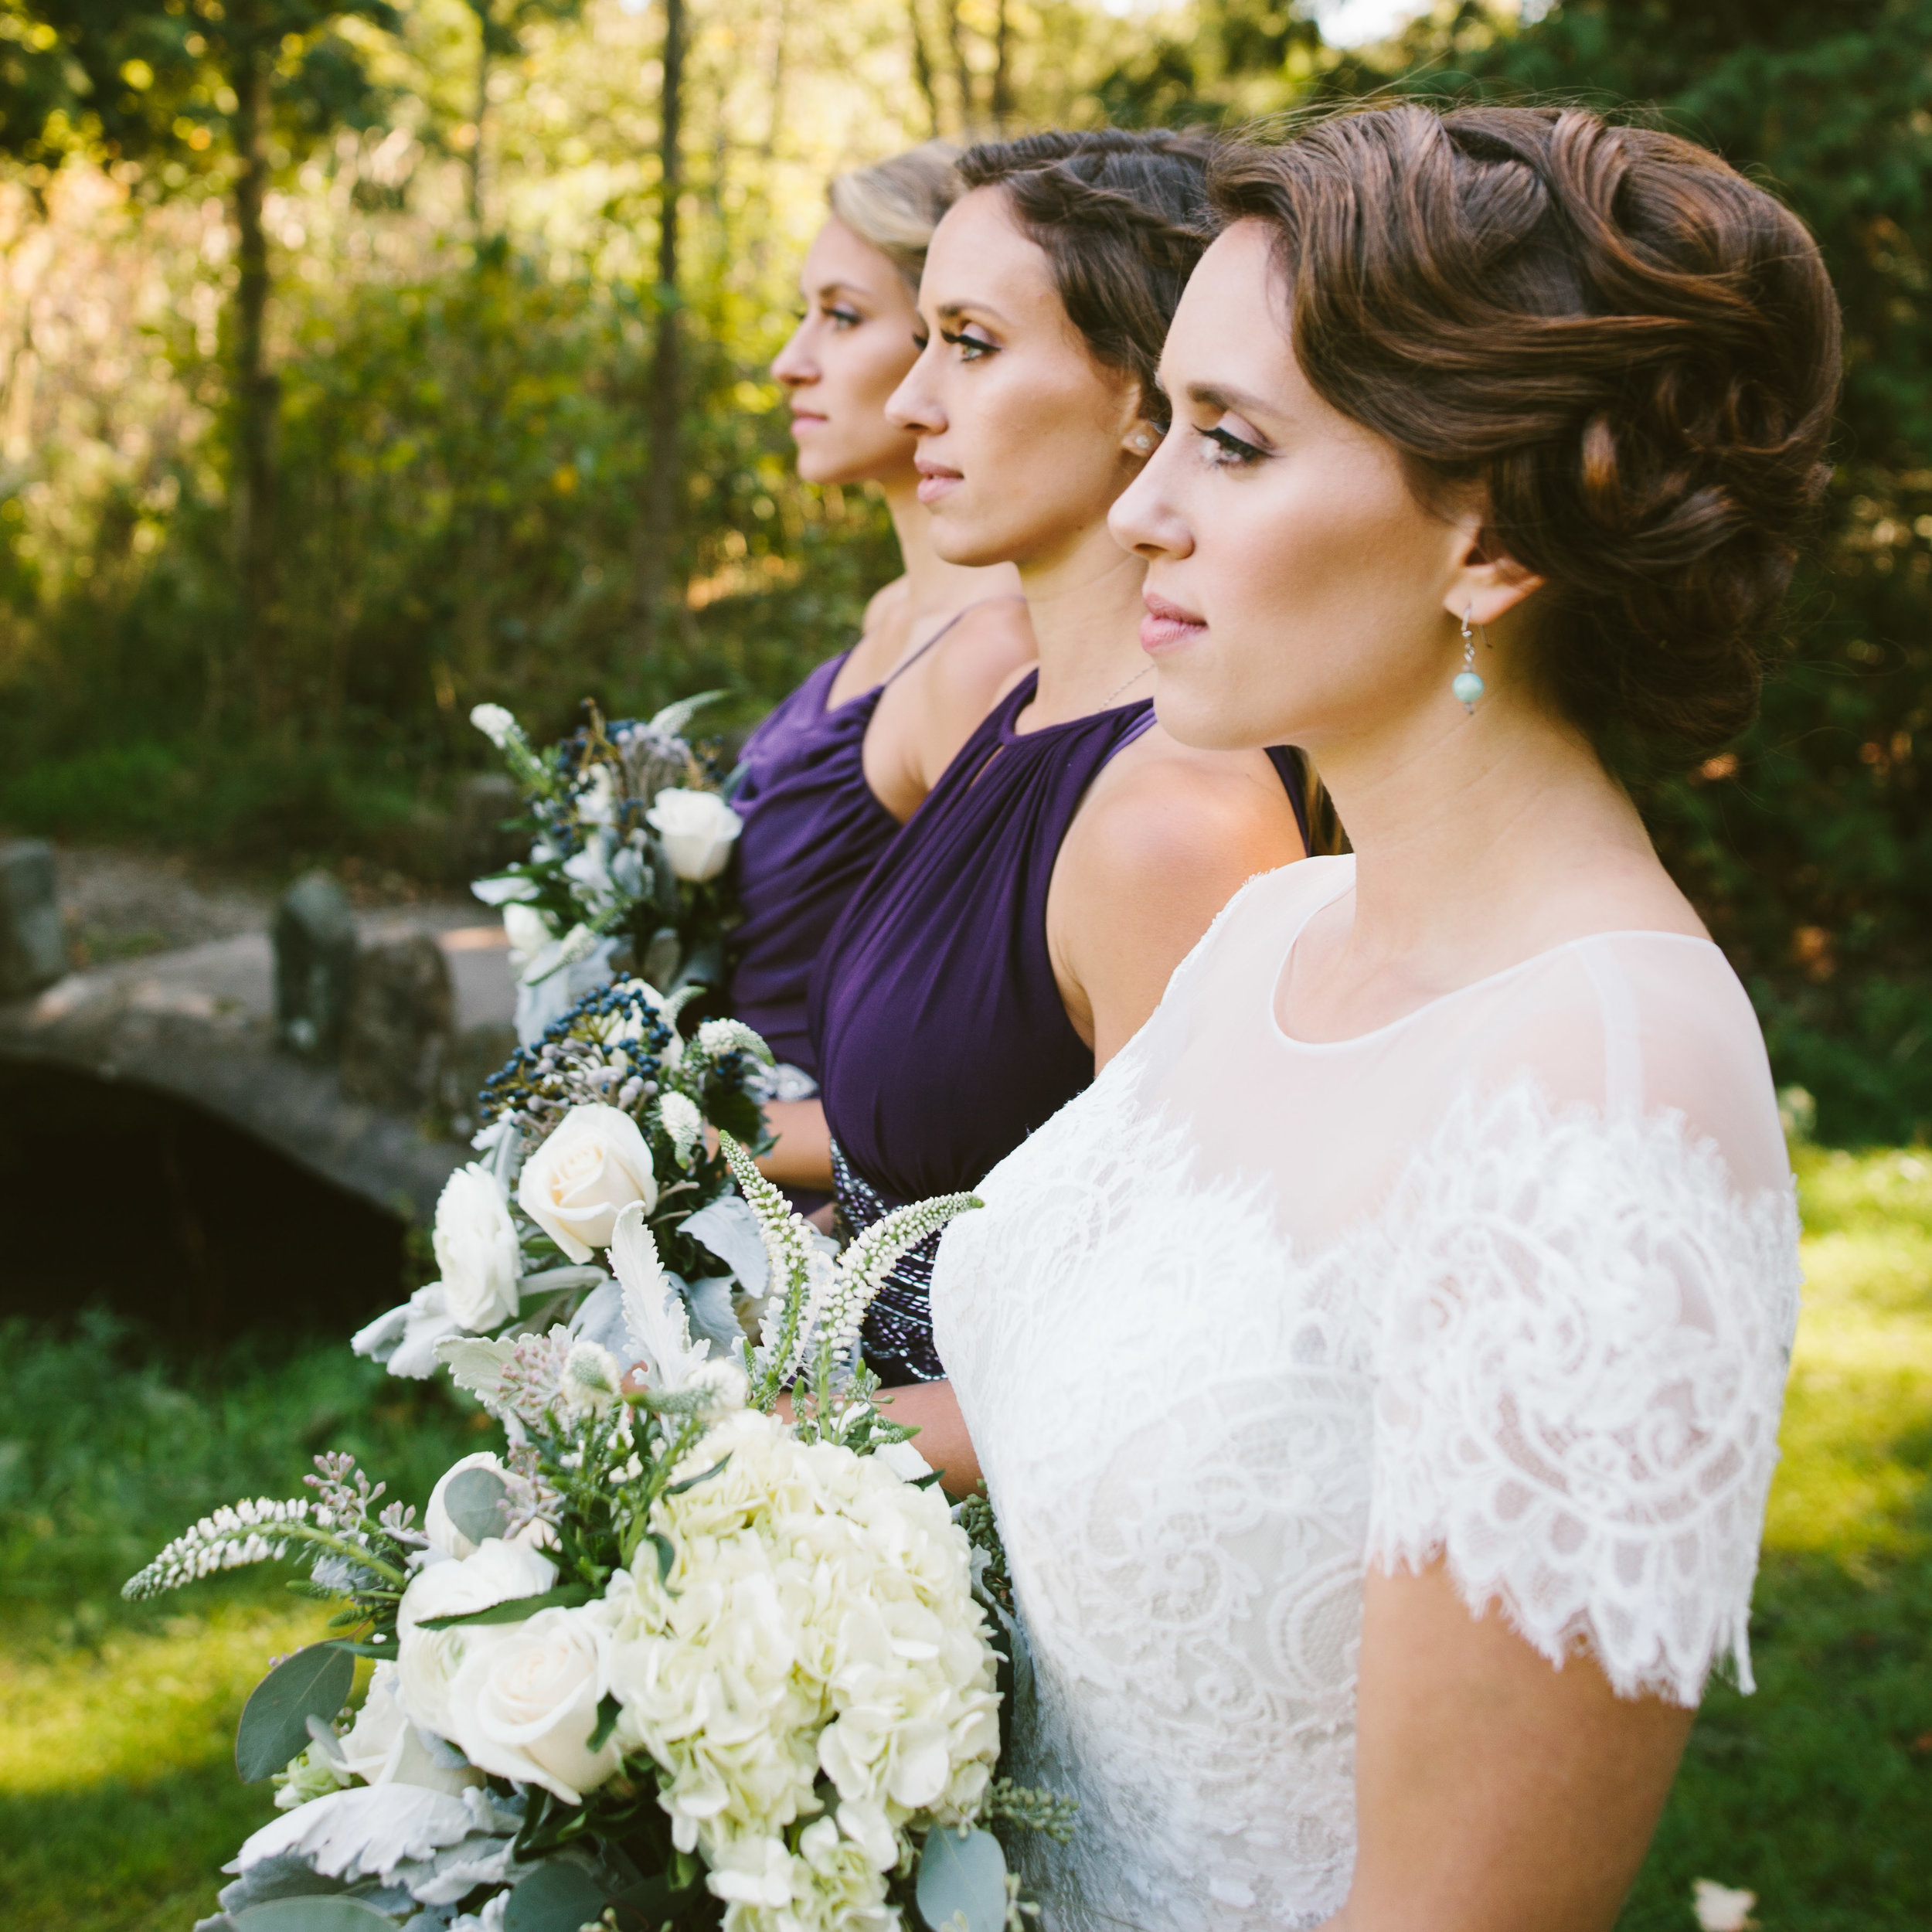 grand_rapids_wedding_rockford_wedding_richard_app_gallery_wedding_grand_rapids_wedding_photographer_summer_wedding_wabasis_lake_park_wedding_rustic_wedding-35.jpg